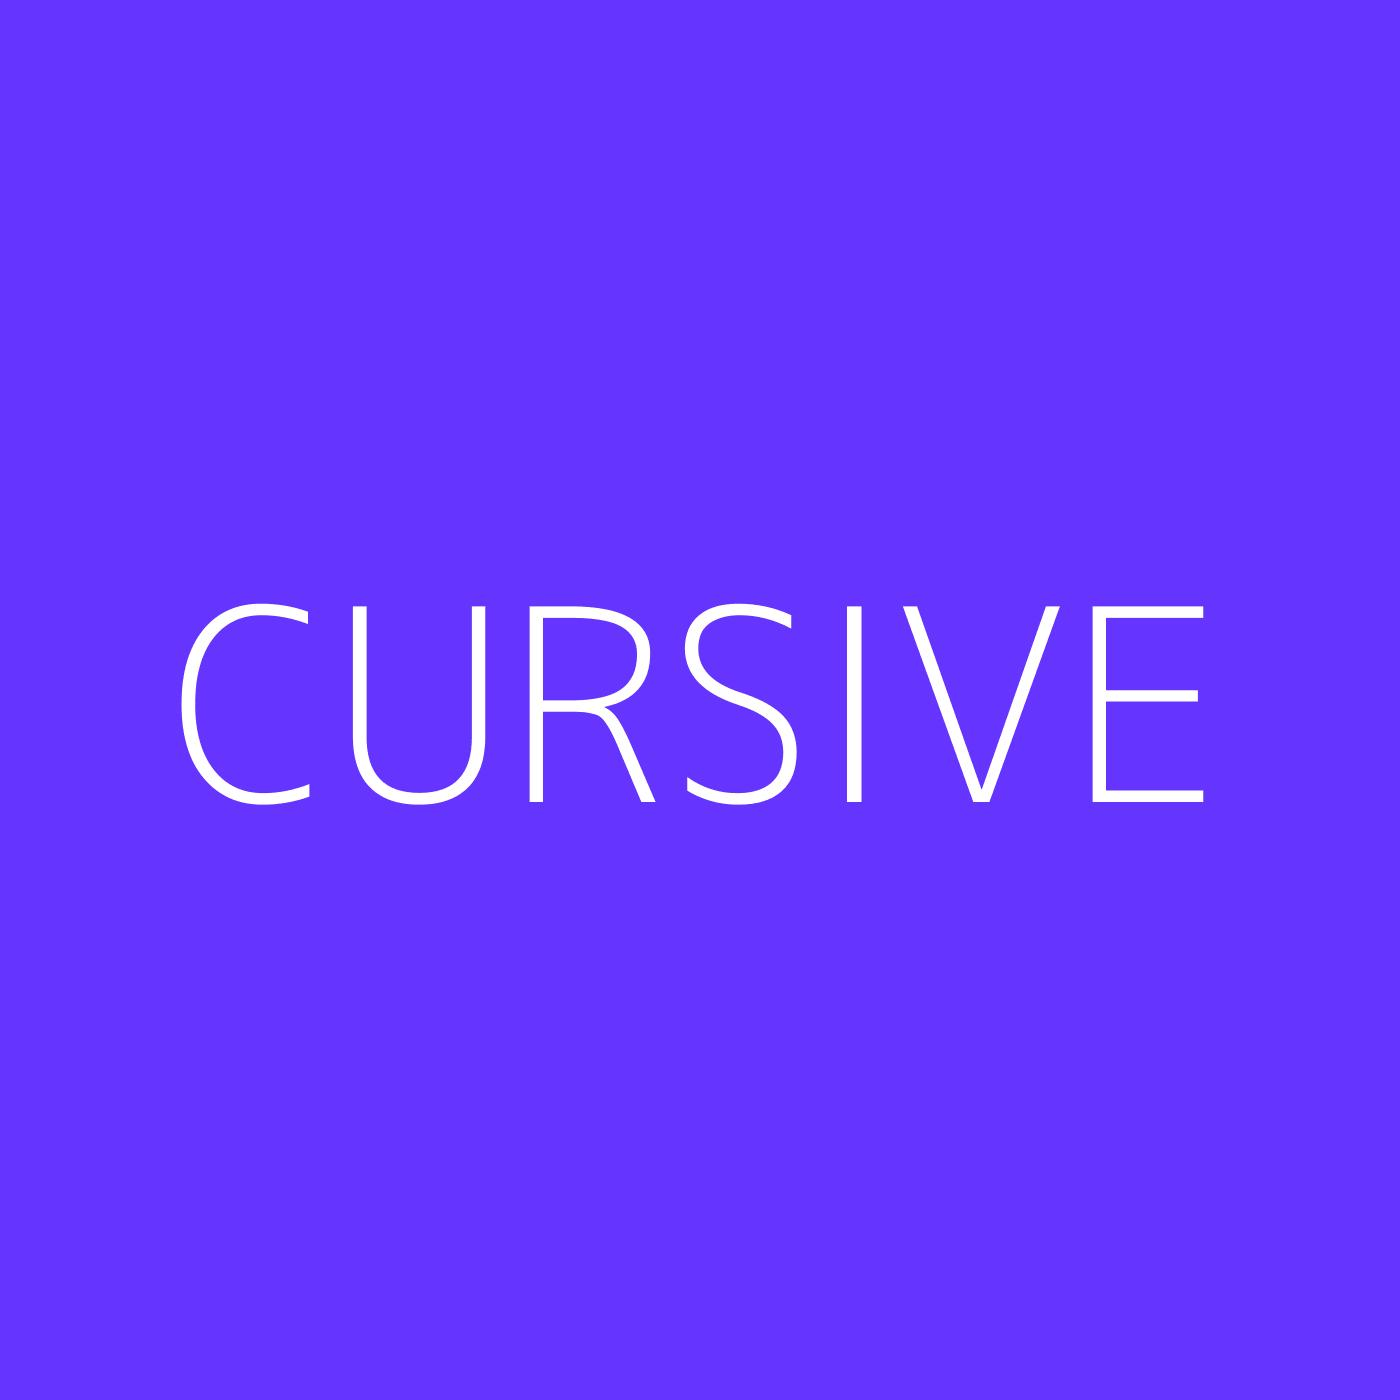 Cursive Playlist Artwork